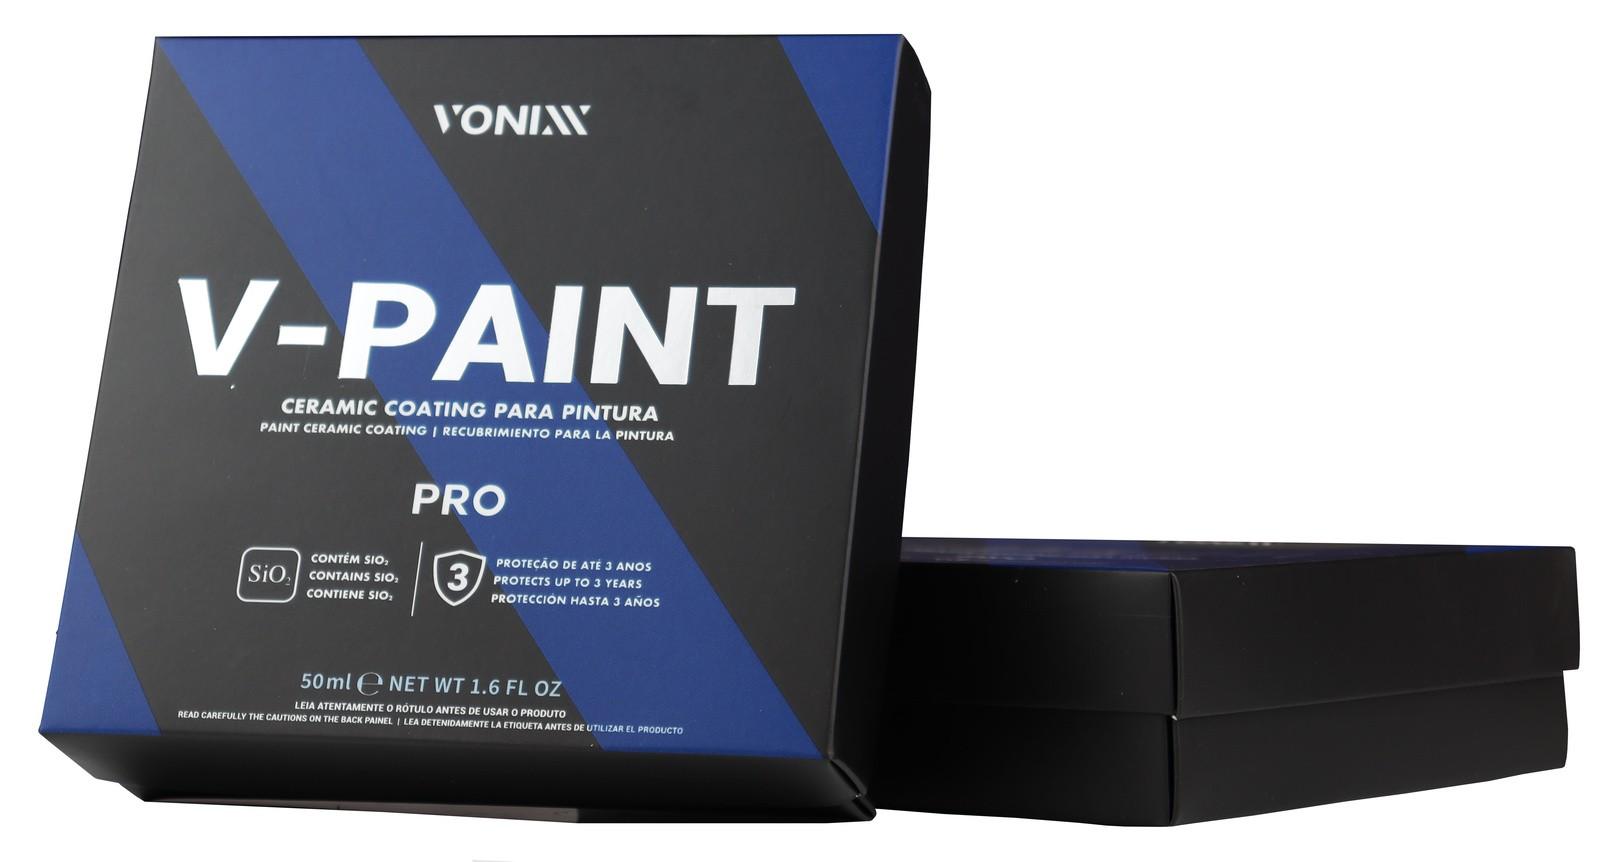 Vitrificador de Pintura V-Paint 50 ml Vonixx